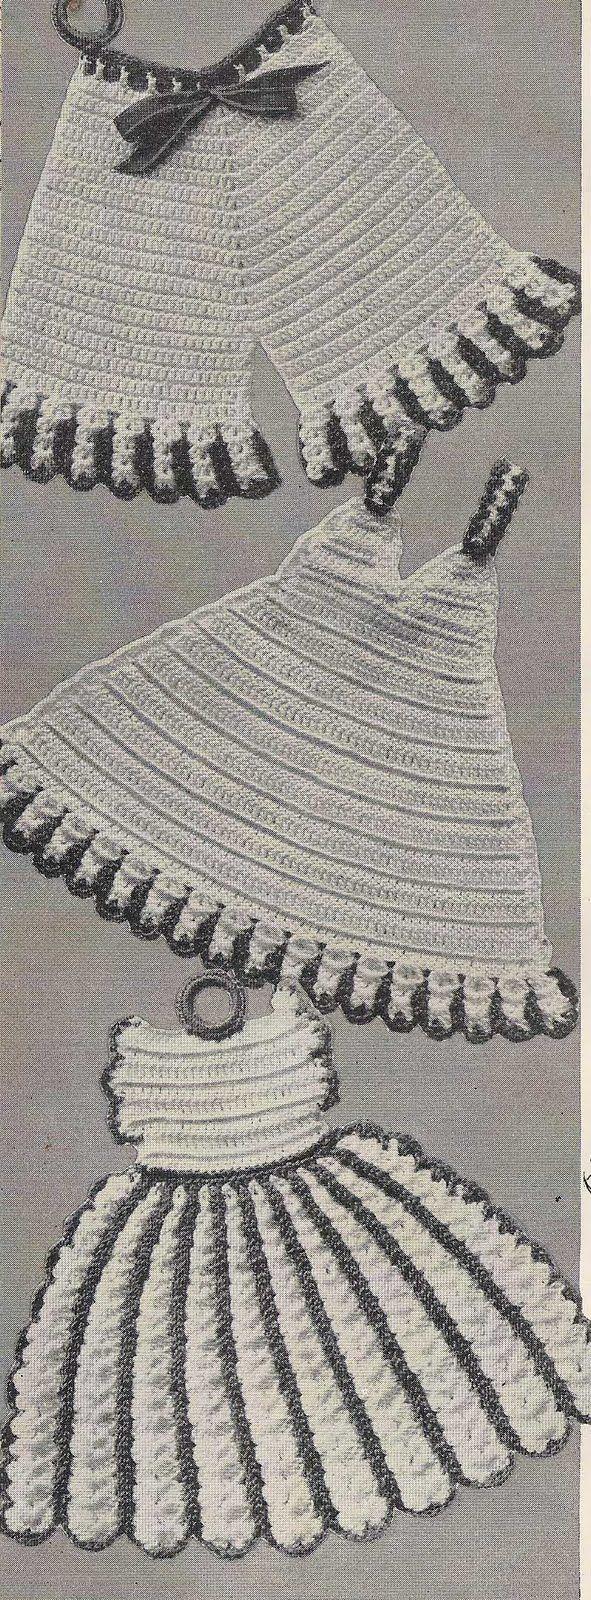 Free Crochet Pot Holder Patterns 5511 Panties Potholder 5512